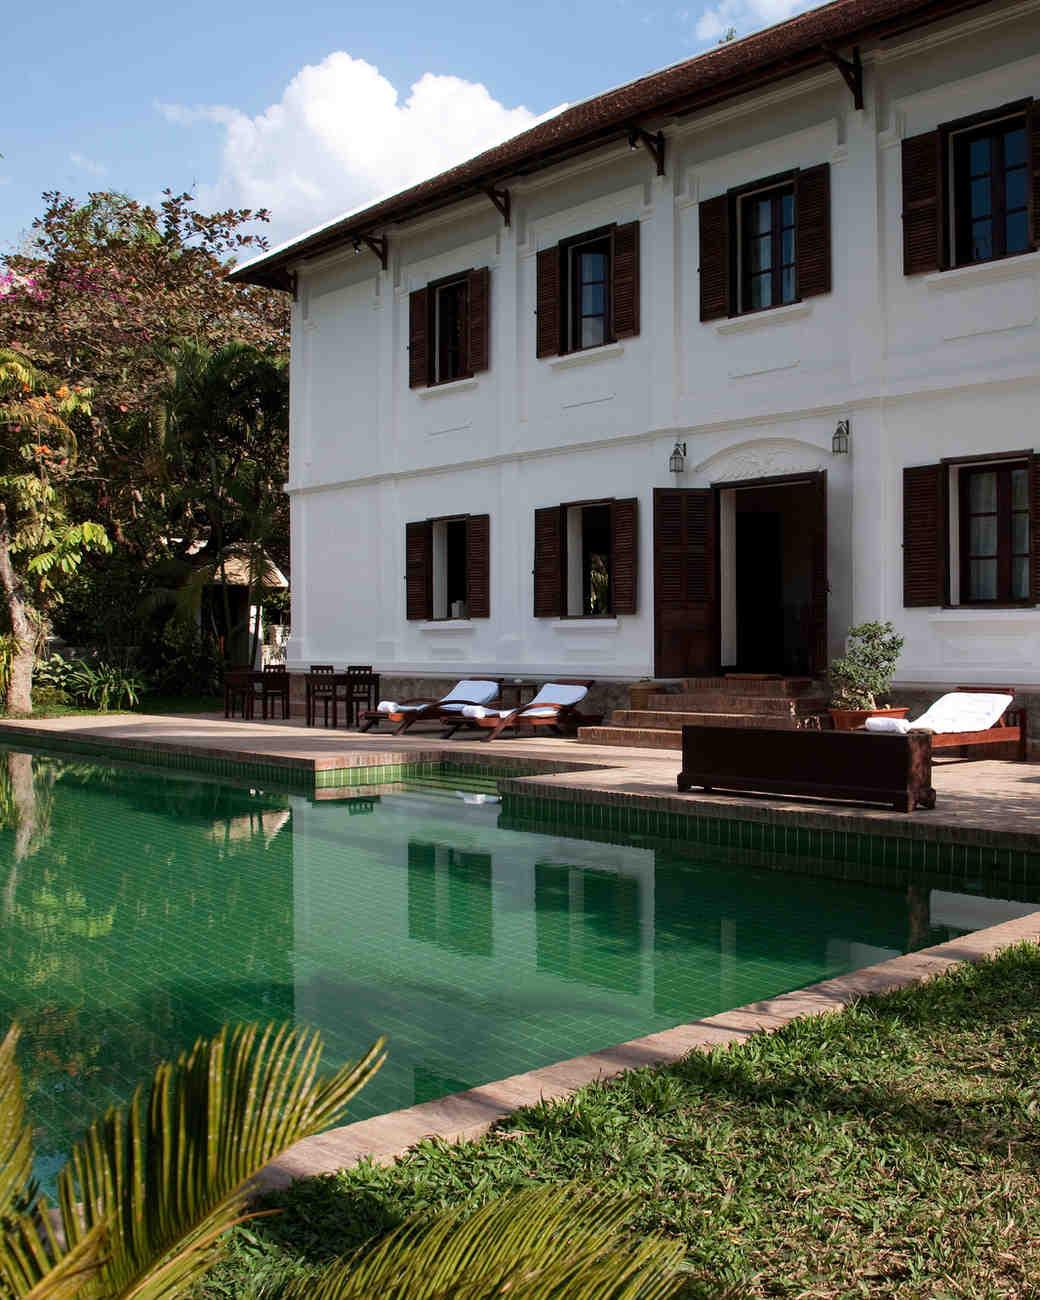 smith-satri-house-luang-prabang-laos.jpg